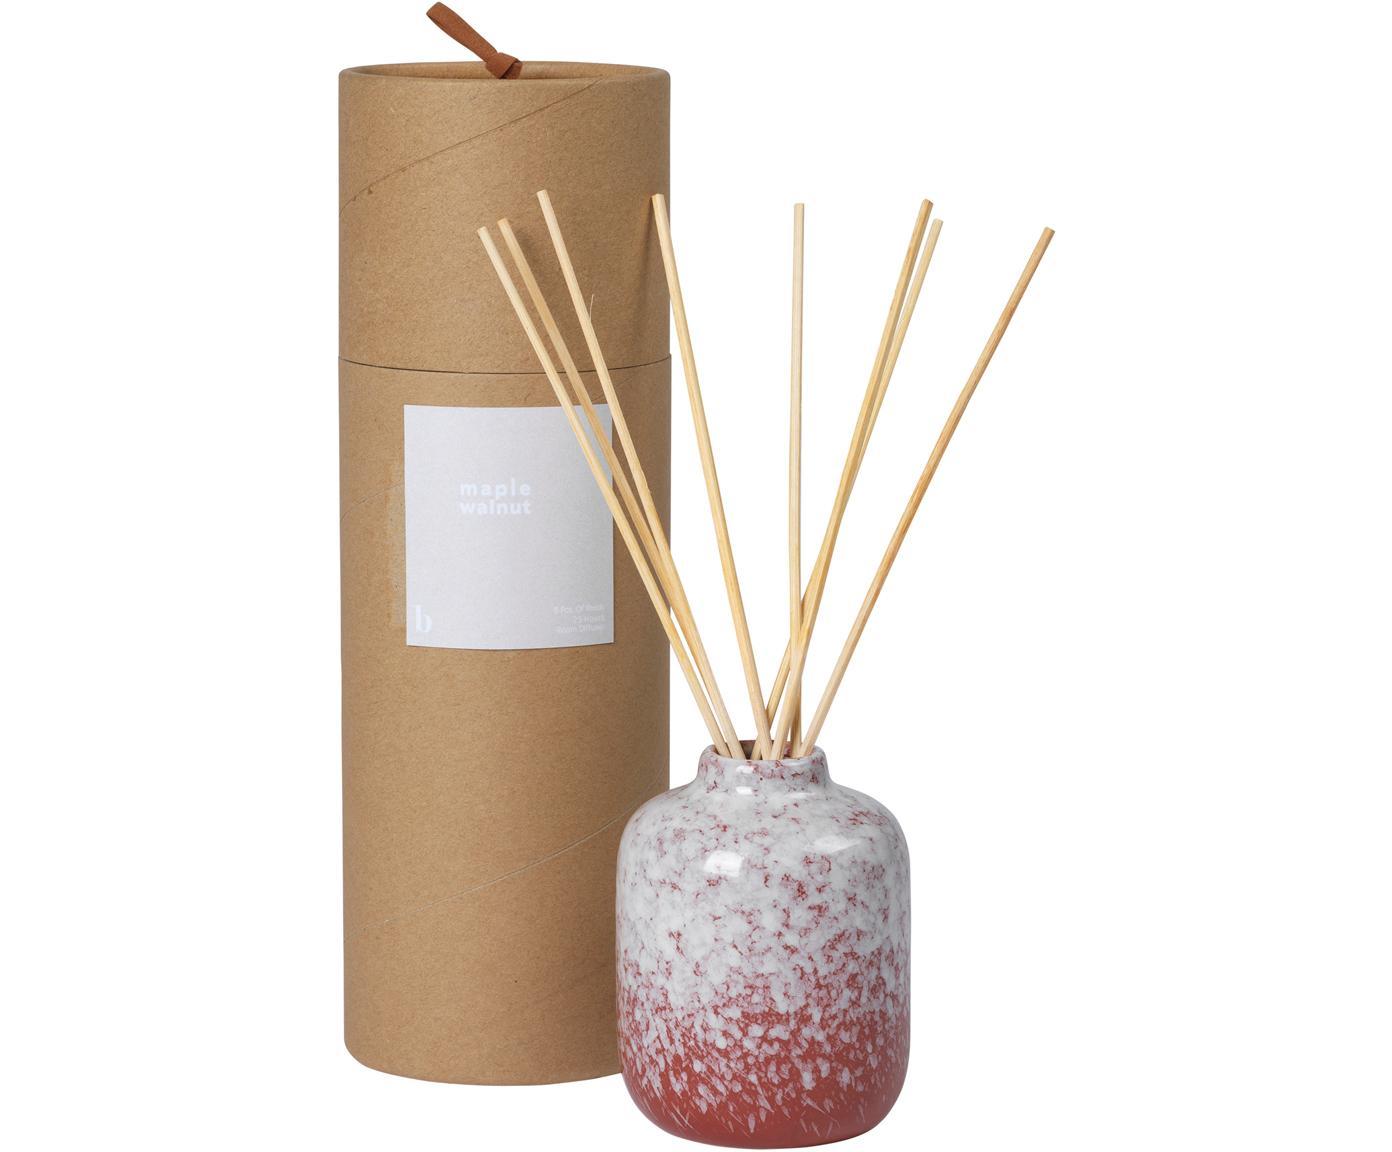 Diffuser Maple Walnut (Walnuss), Behälter: Keramik, Rot, Weiss, Ø 7 x H 9 cm